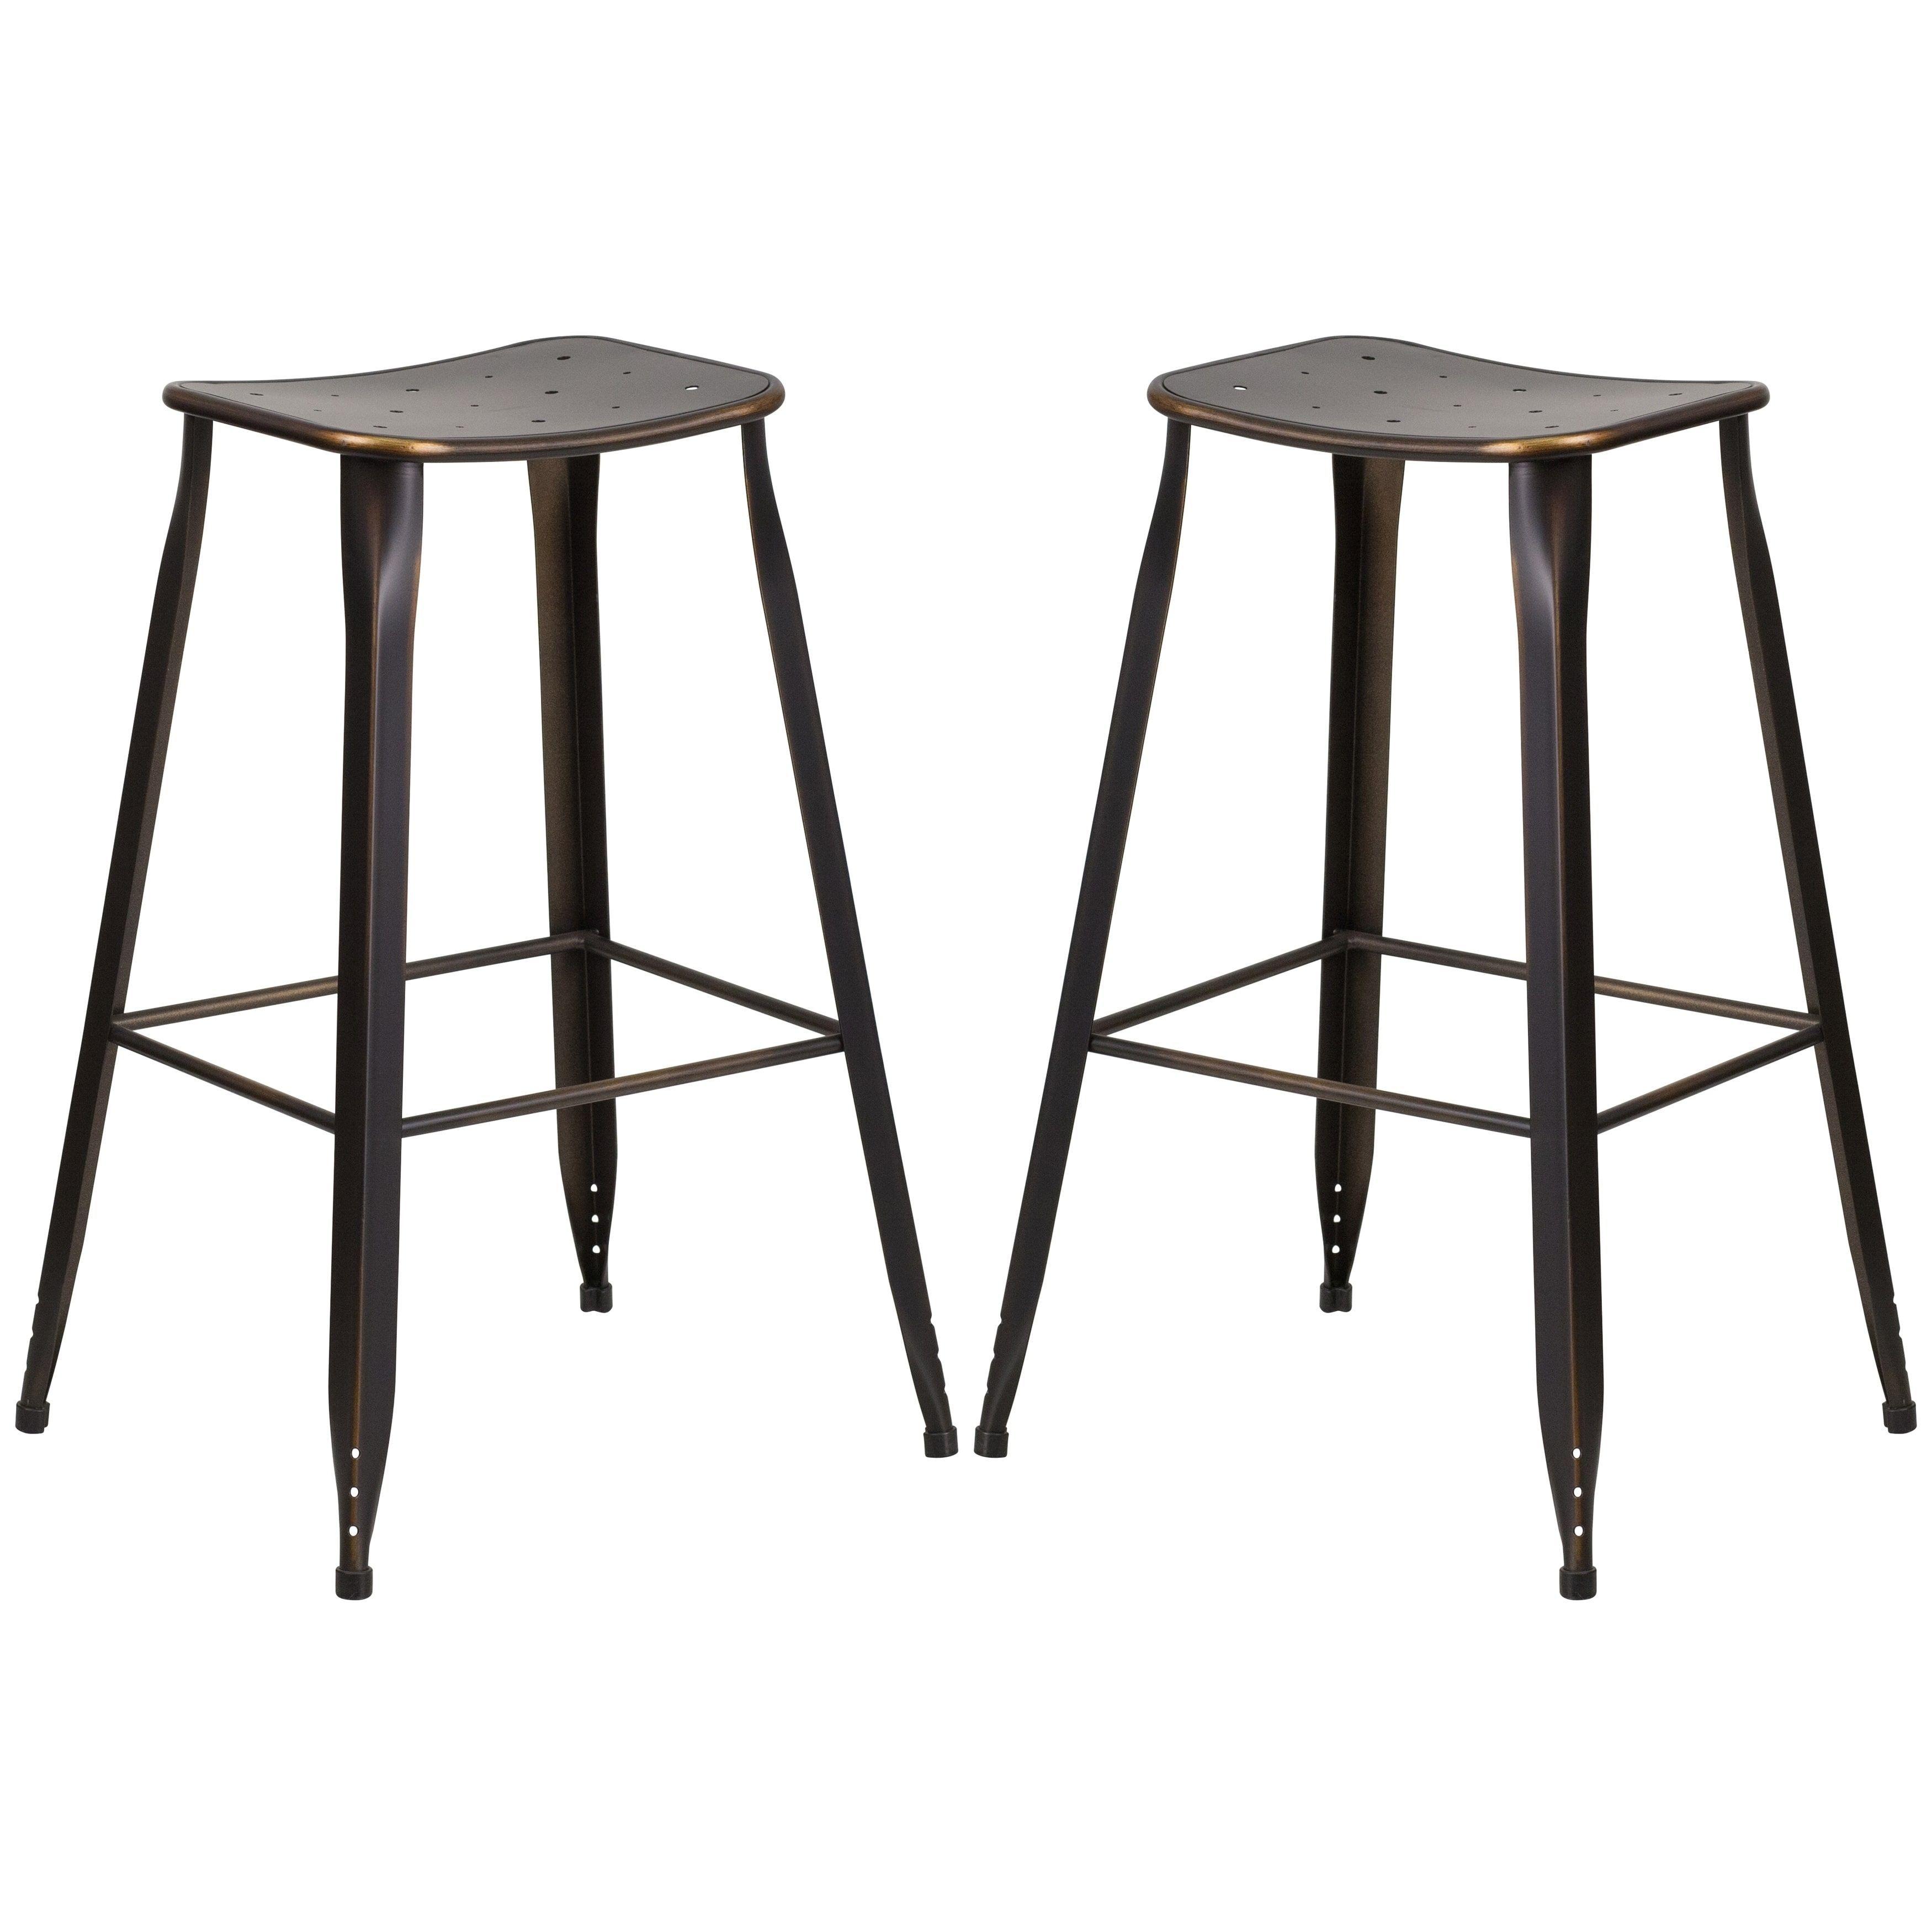 Super Distressed Copper Galvanized Metal 30 Inch Bar Stool 4 Creativecarmelina Interior Chair Design Creativecarmelinacom